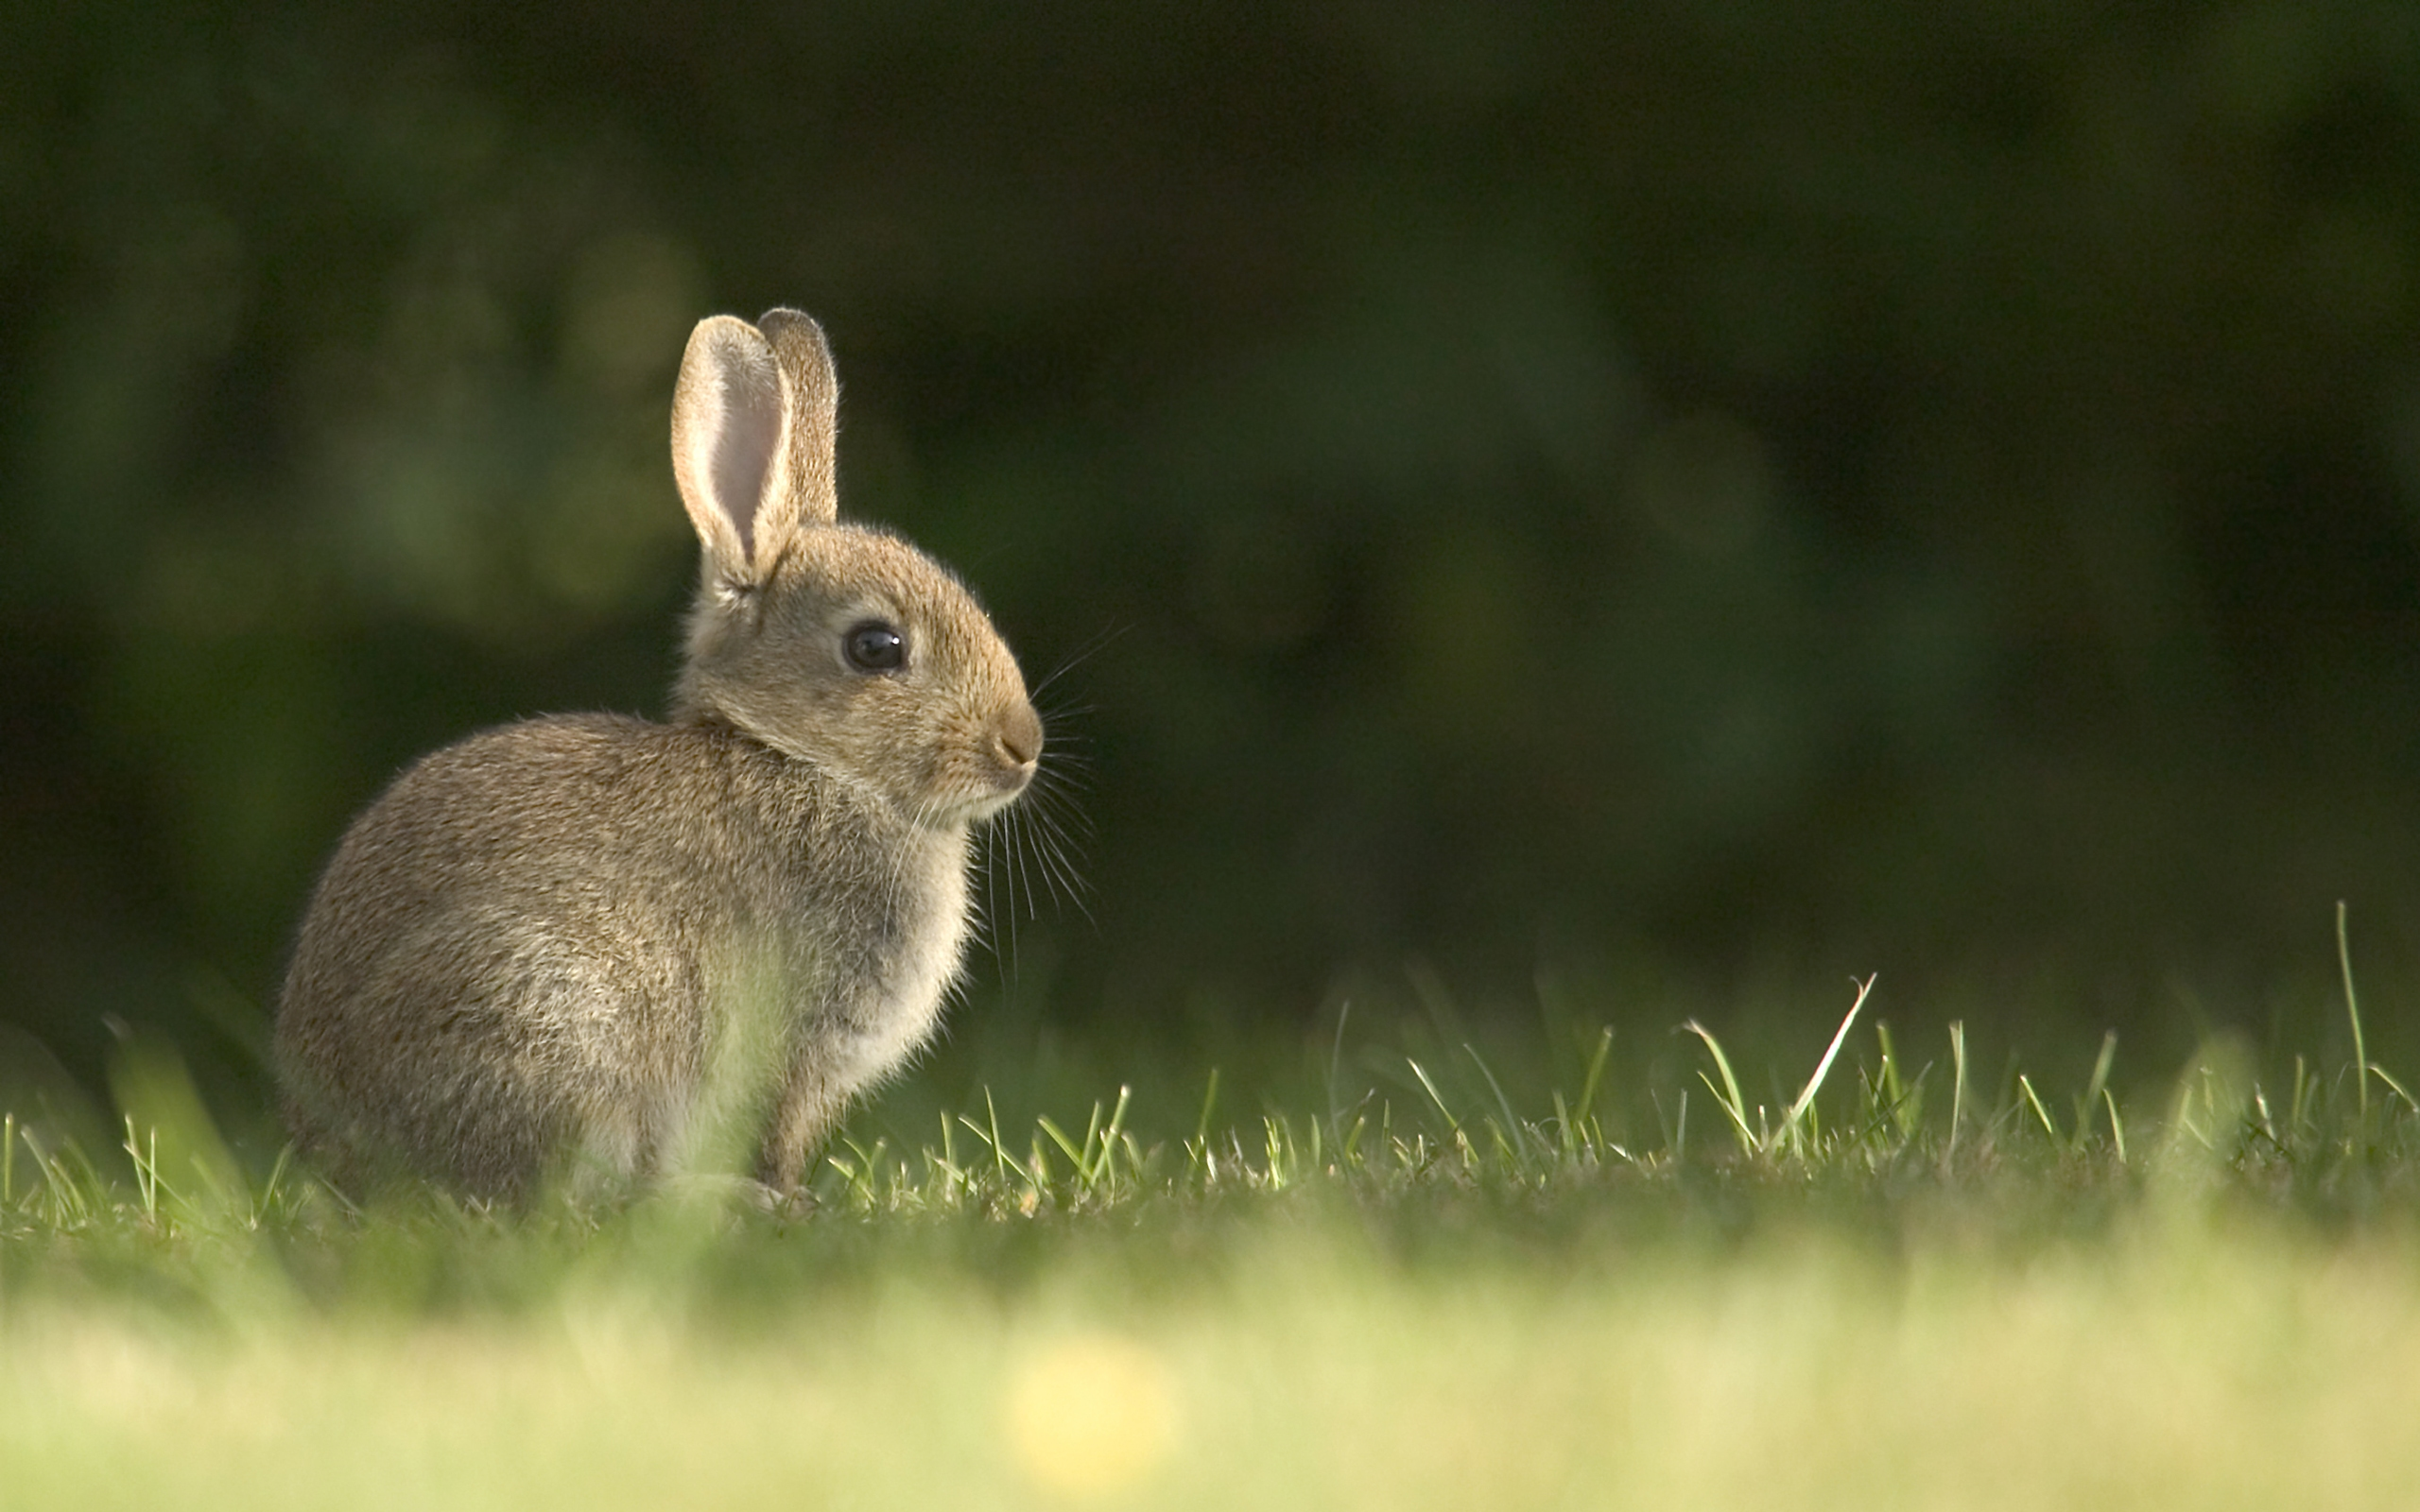 bunny computer wallpapers - photo #19